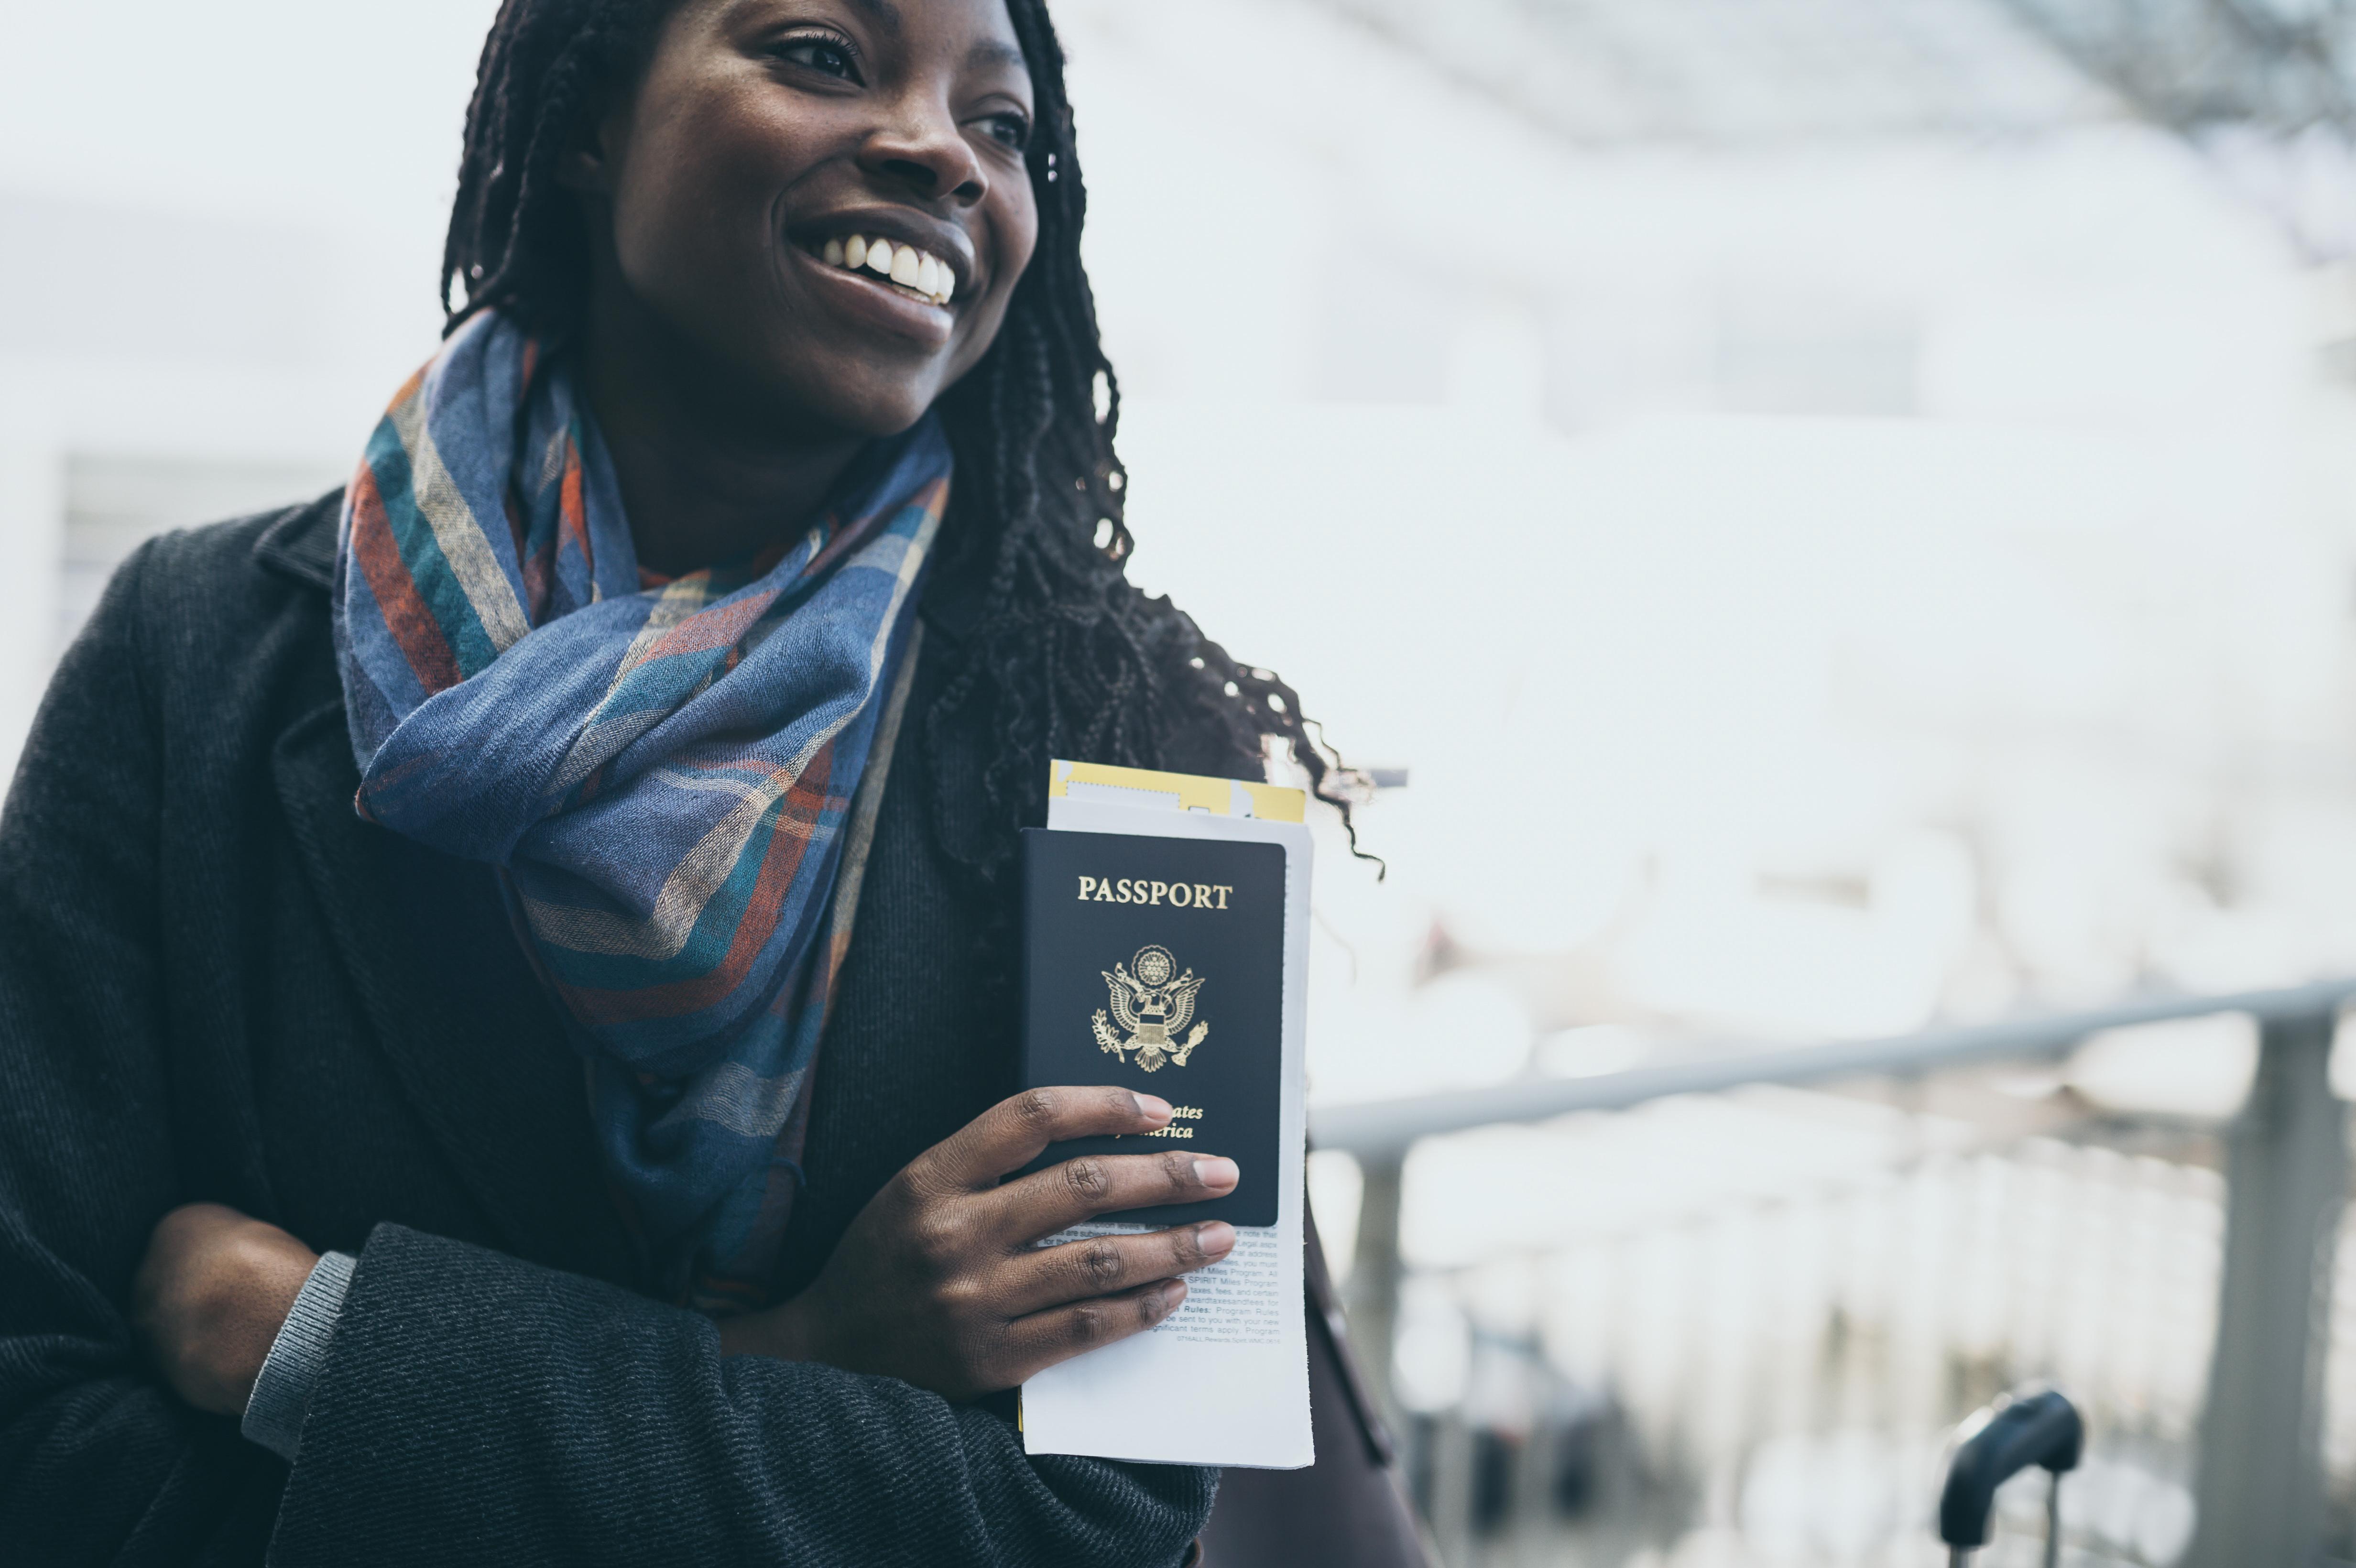 Young woman at airport